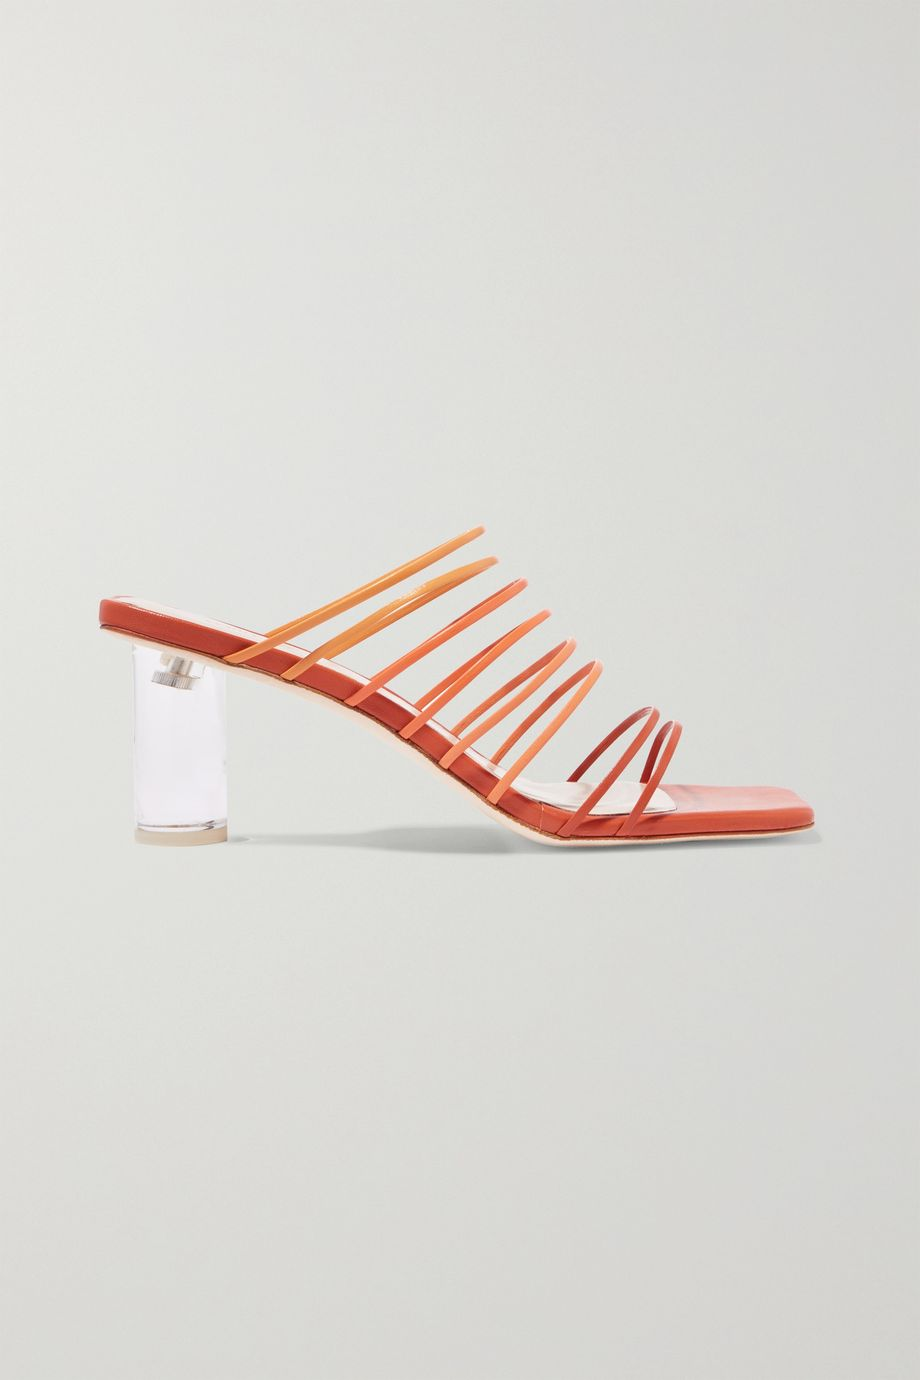 REJINA PYO Zoe ombré leather sandals